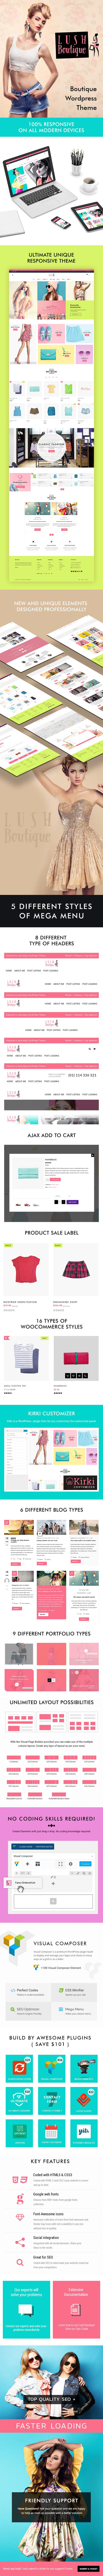 Lush Boutique - Fashion WordPress Theme - 1